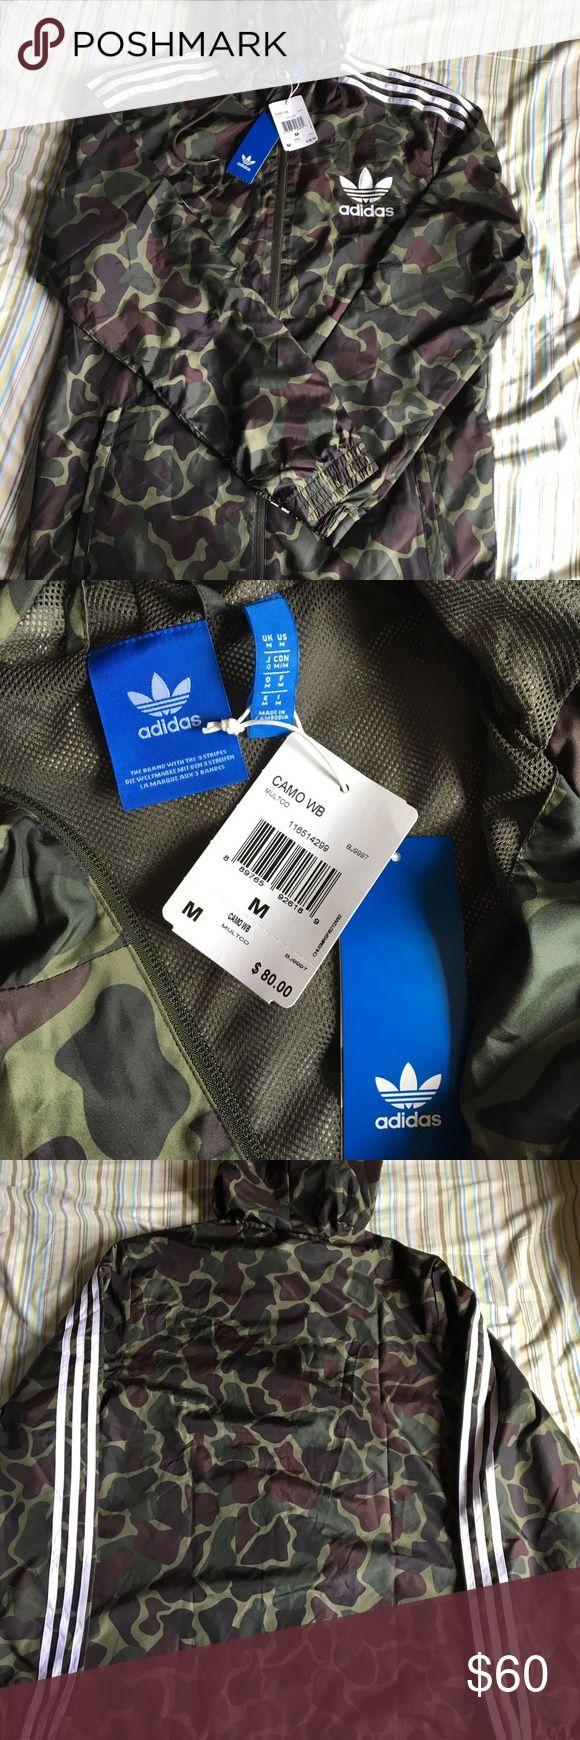 Adidas windbreaker Adidas camouflage windbreaker Adidas Jackets & Coats Windbreakers